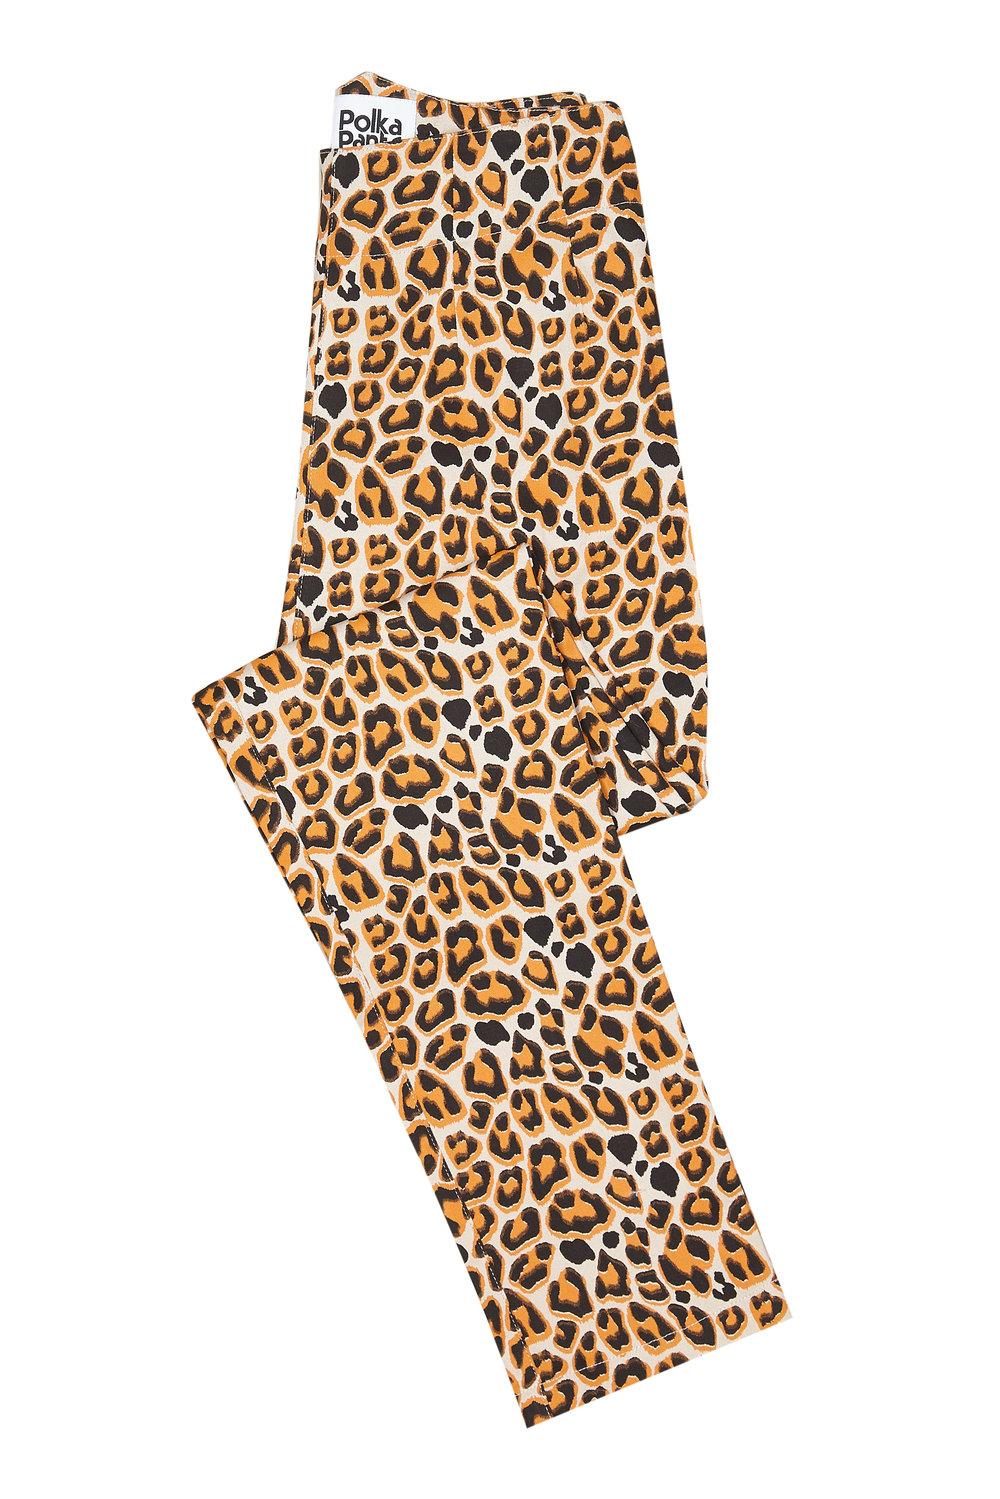 PolkaPants_Gizzi-Erskine-Leopard_Folded_HiRes.jpg